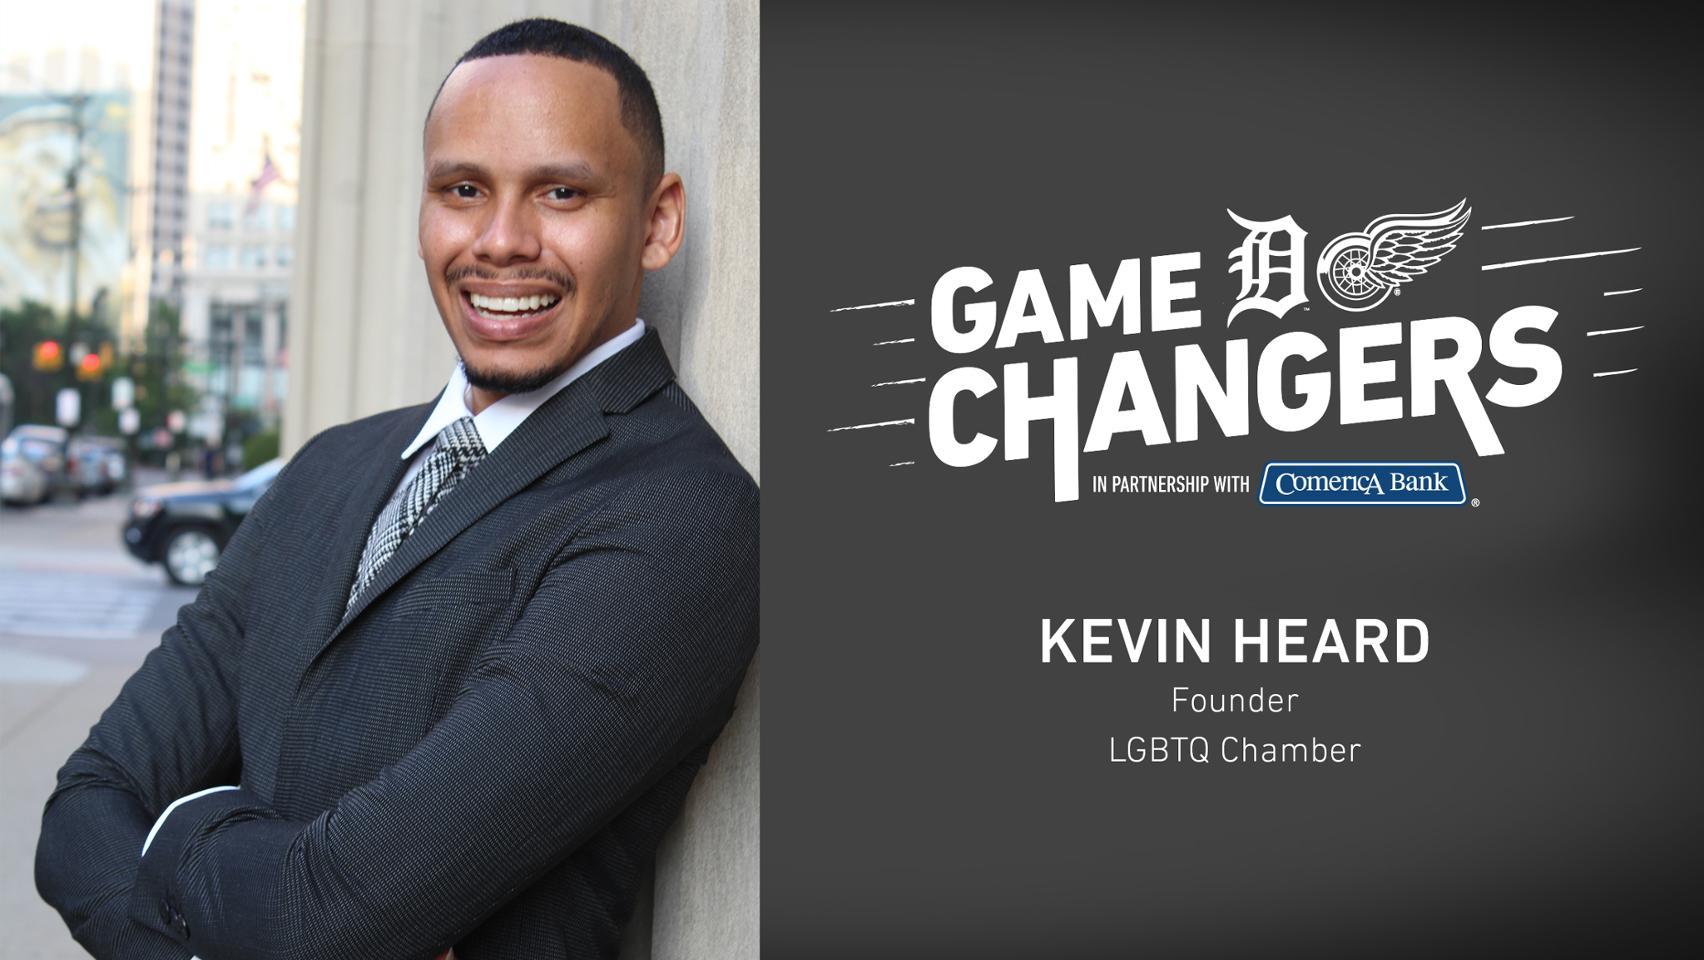 Kevin Heard